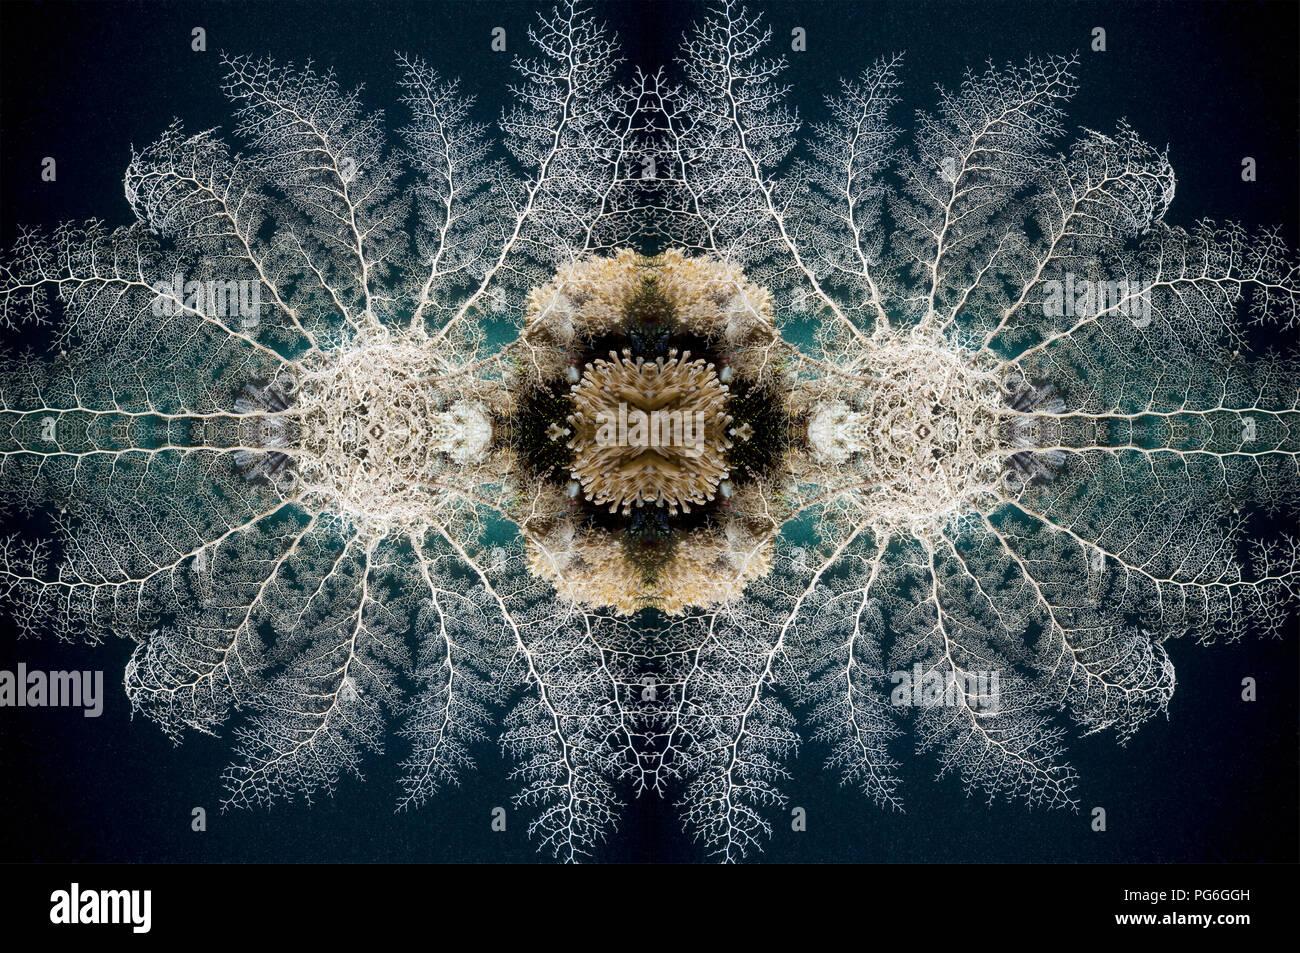 Featherstar (Crinoid sp.) on coral.  Moto Mount, Indonesia.  (Digital capture). - Stock Image